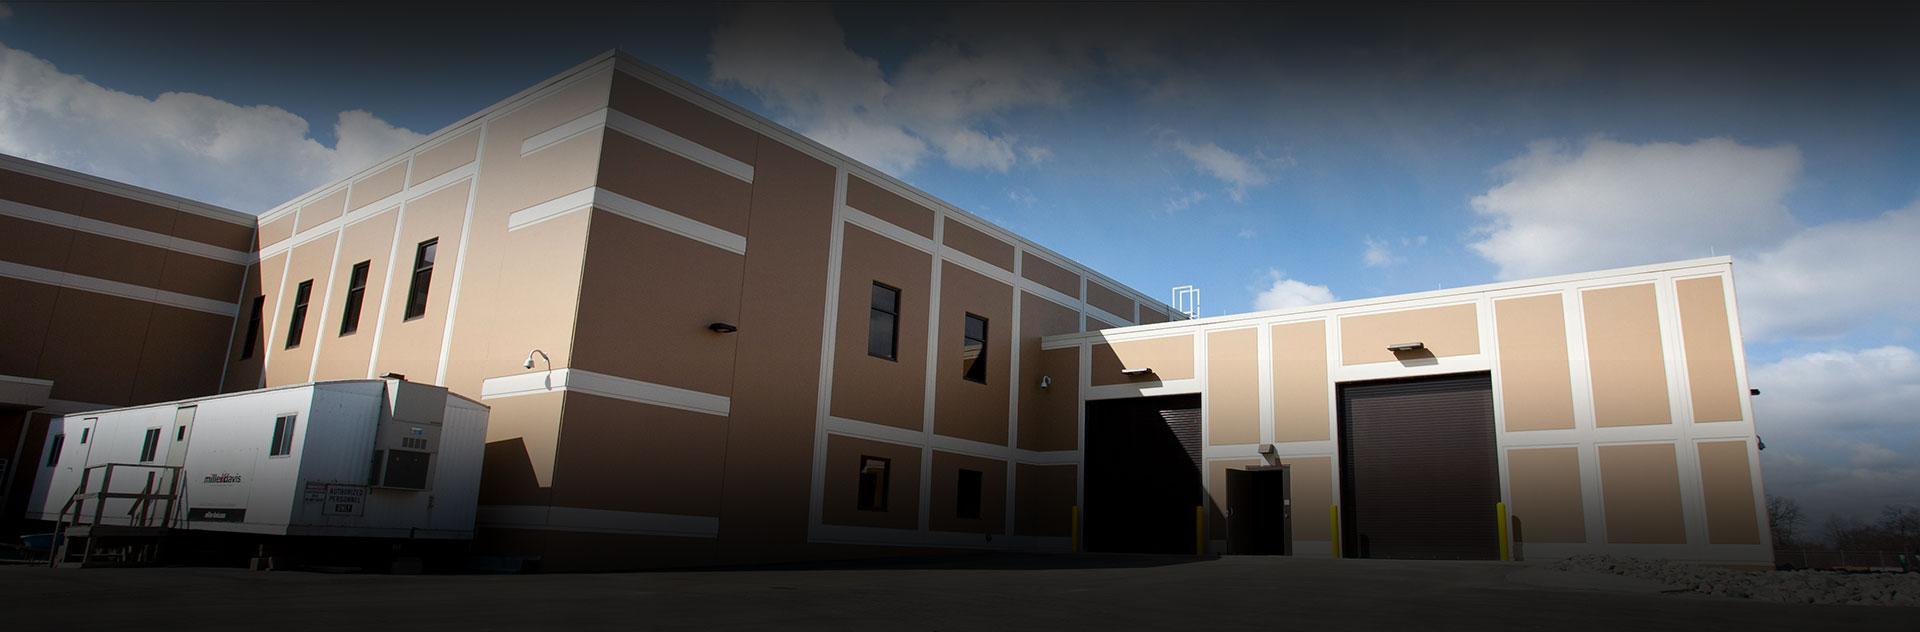 Kzoo-County-Jail-Improvements